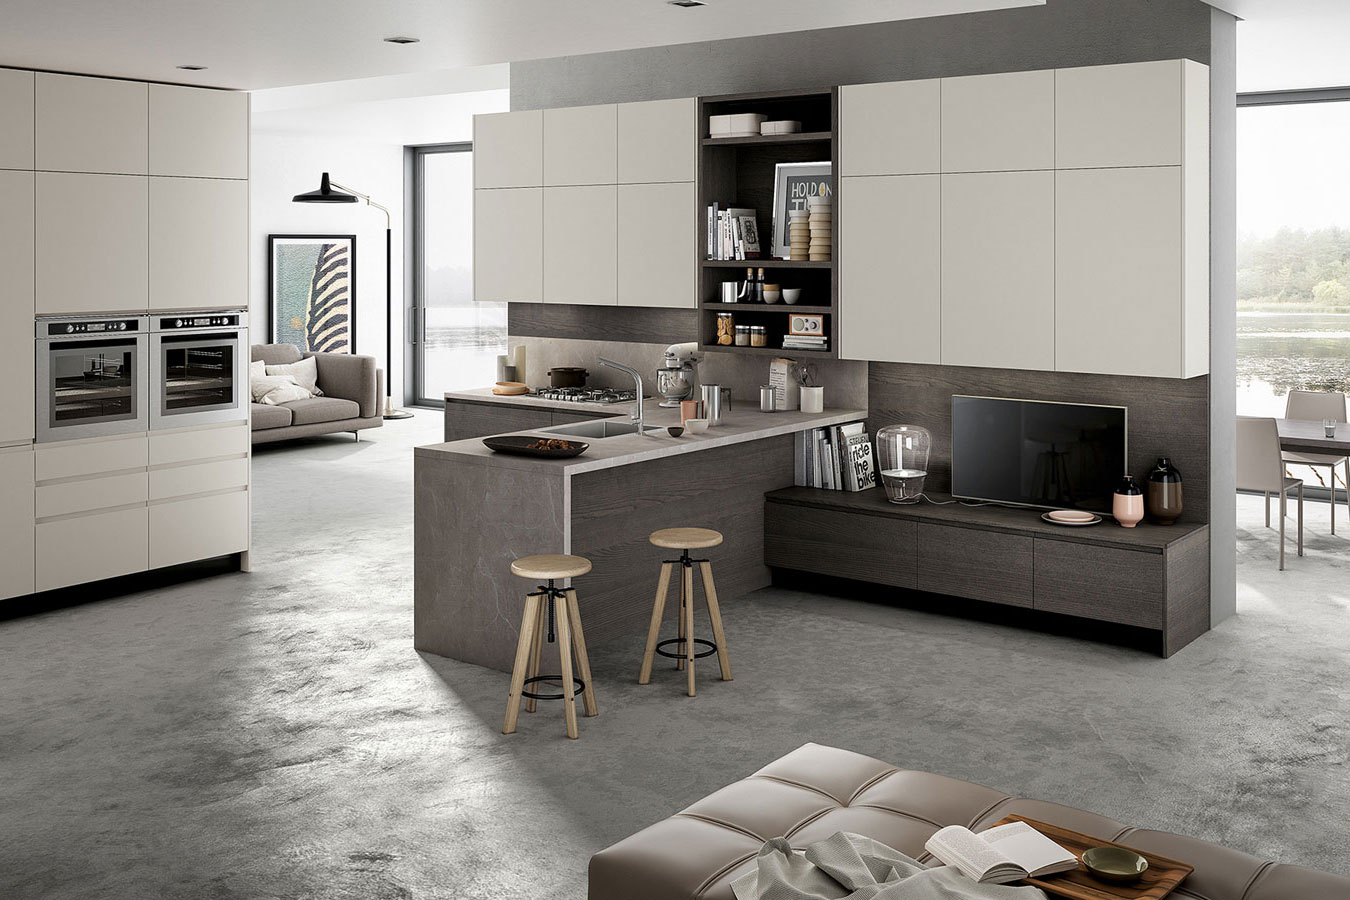 Cucina wega di arredo3 righetti mobili novara for Arredo cucina design